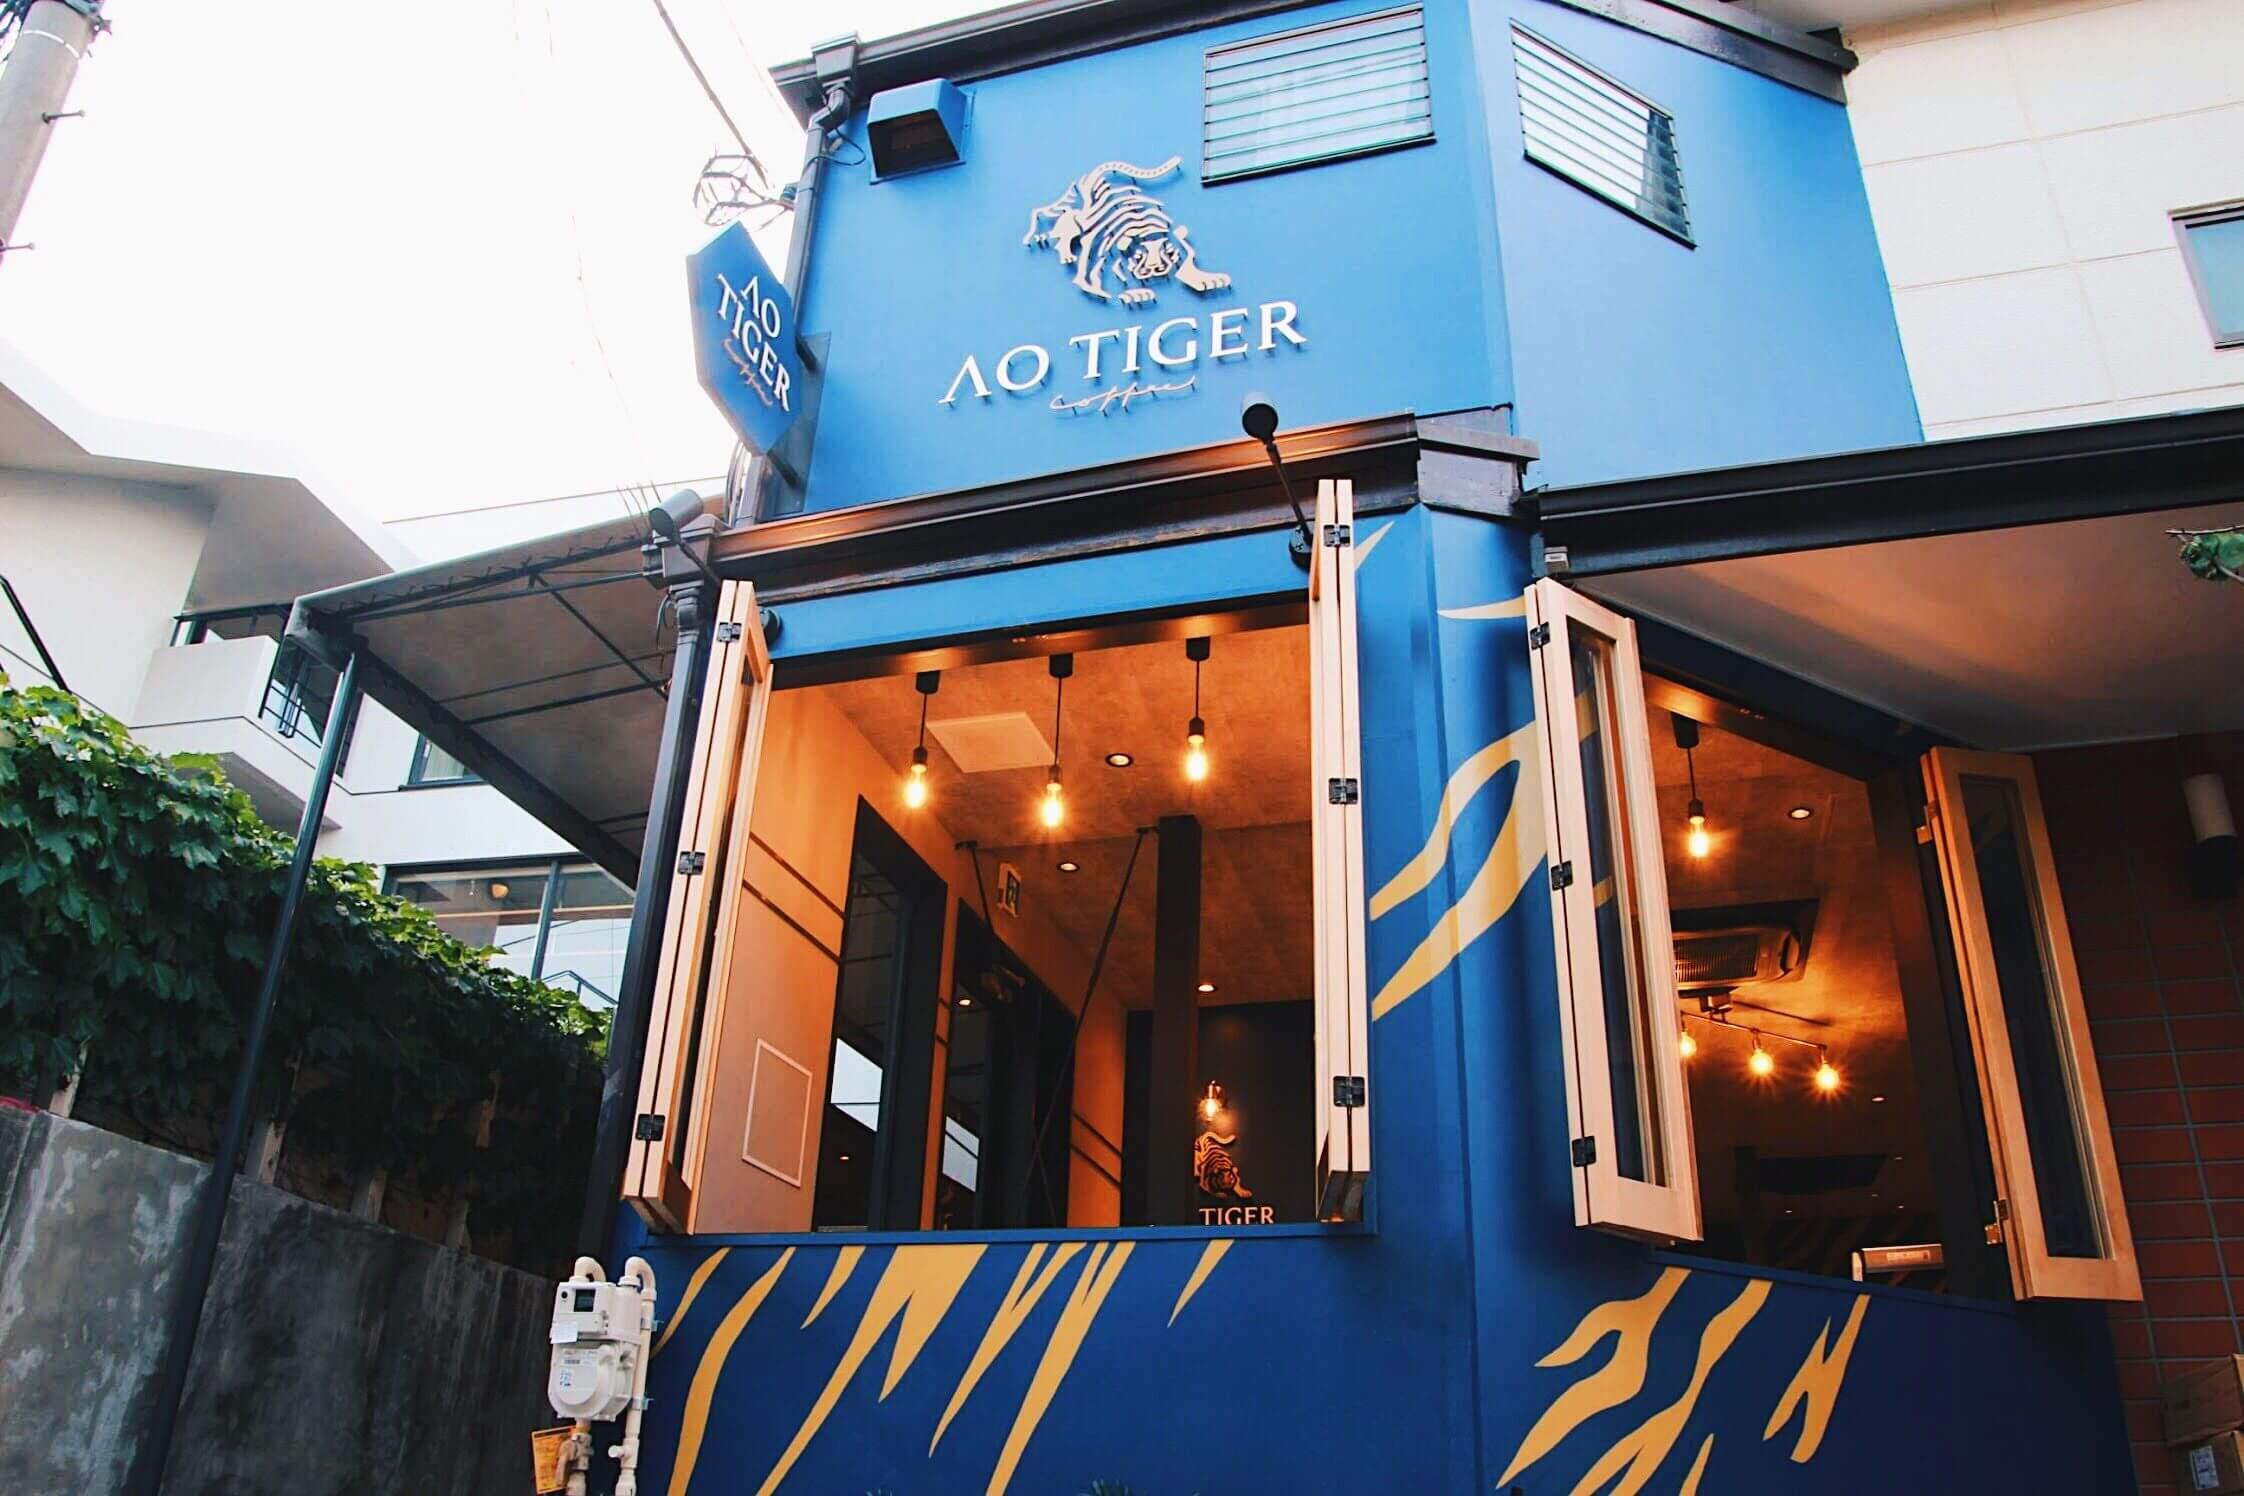 AOTIGER Coffee 原宿 Harajuku アオタイガー コーヒー フルーツコーヒー furuits coffee 外観